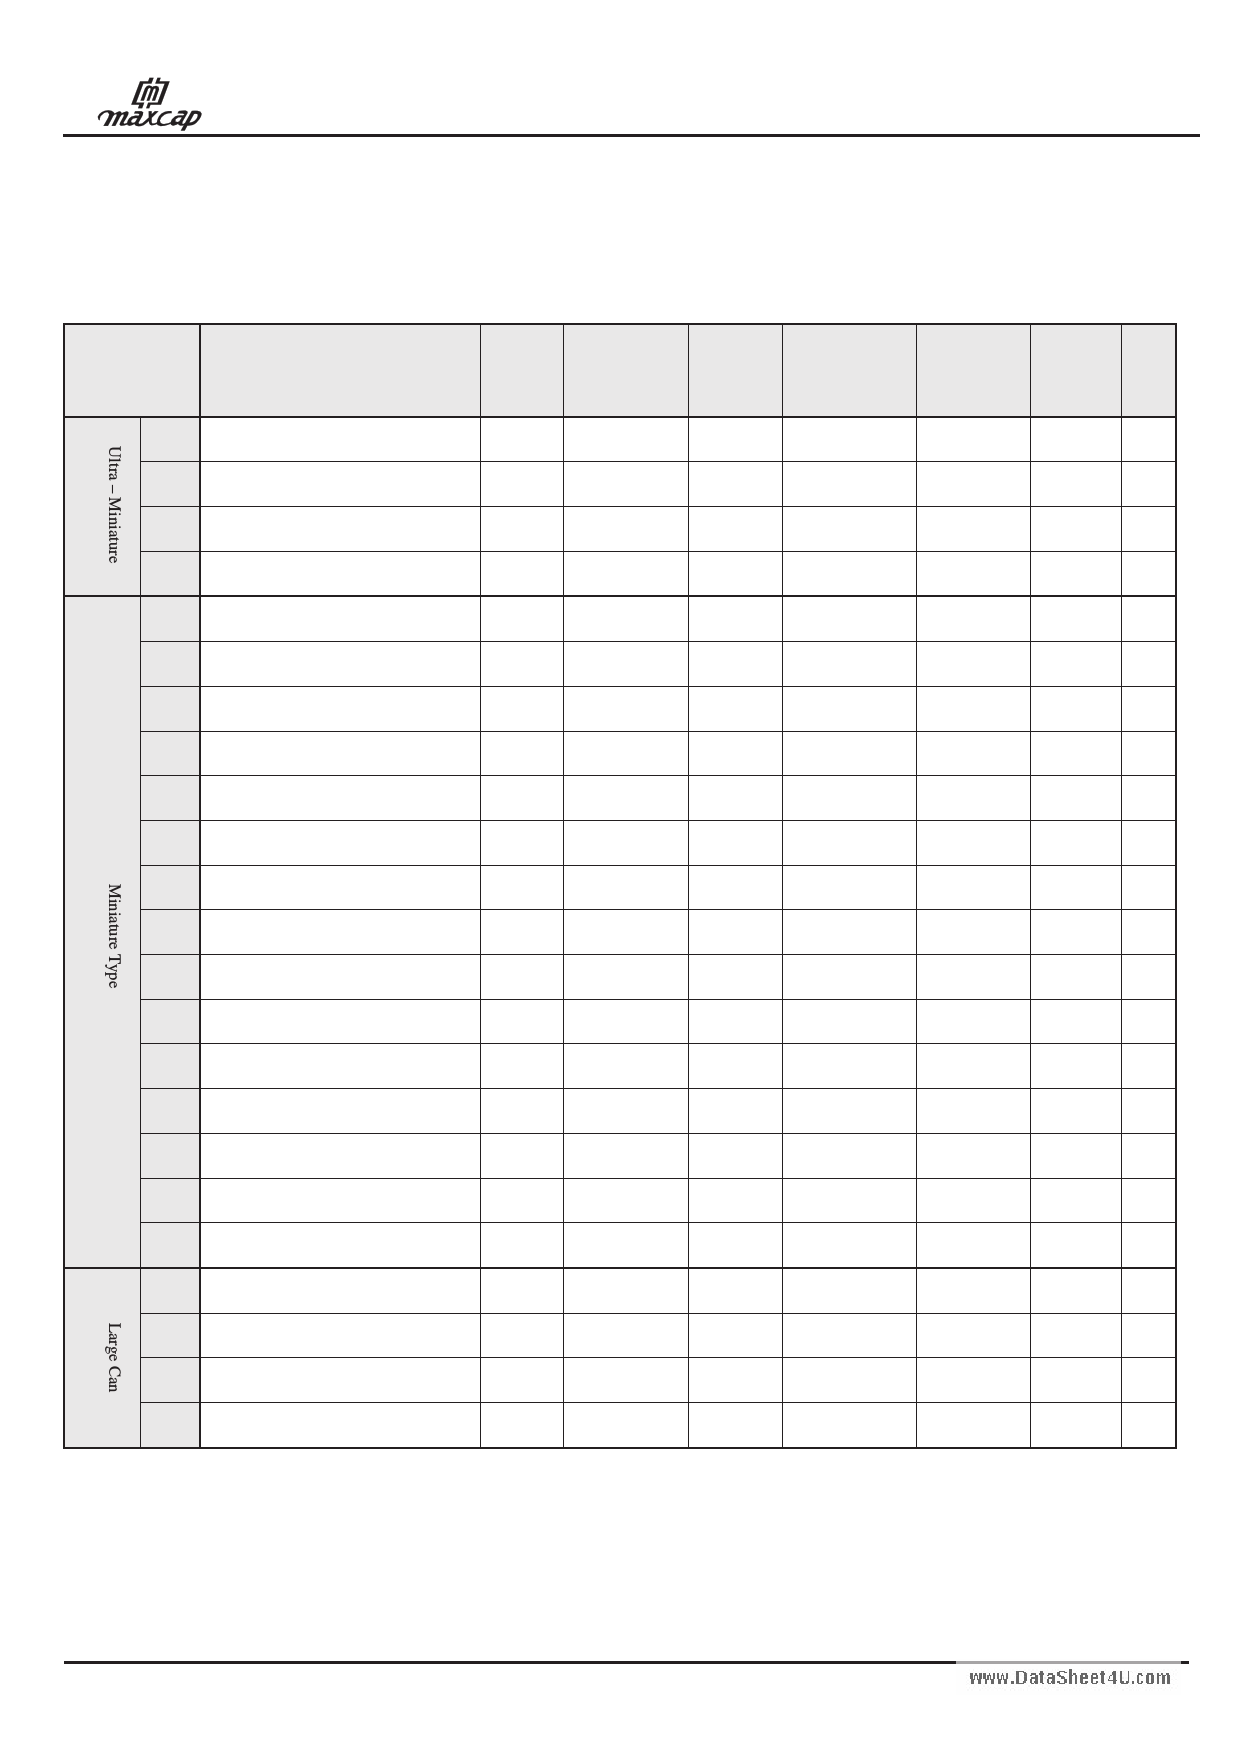 E050225M pdf, 반도체, 판매, 대치품